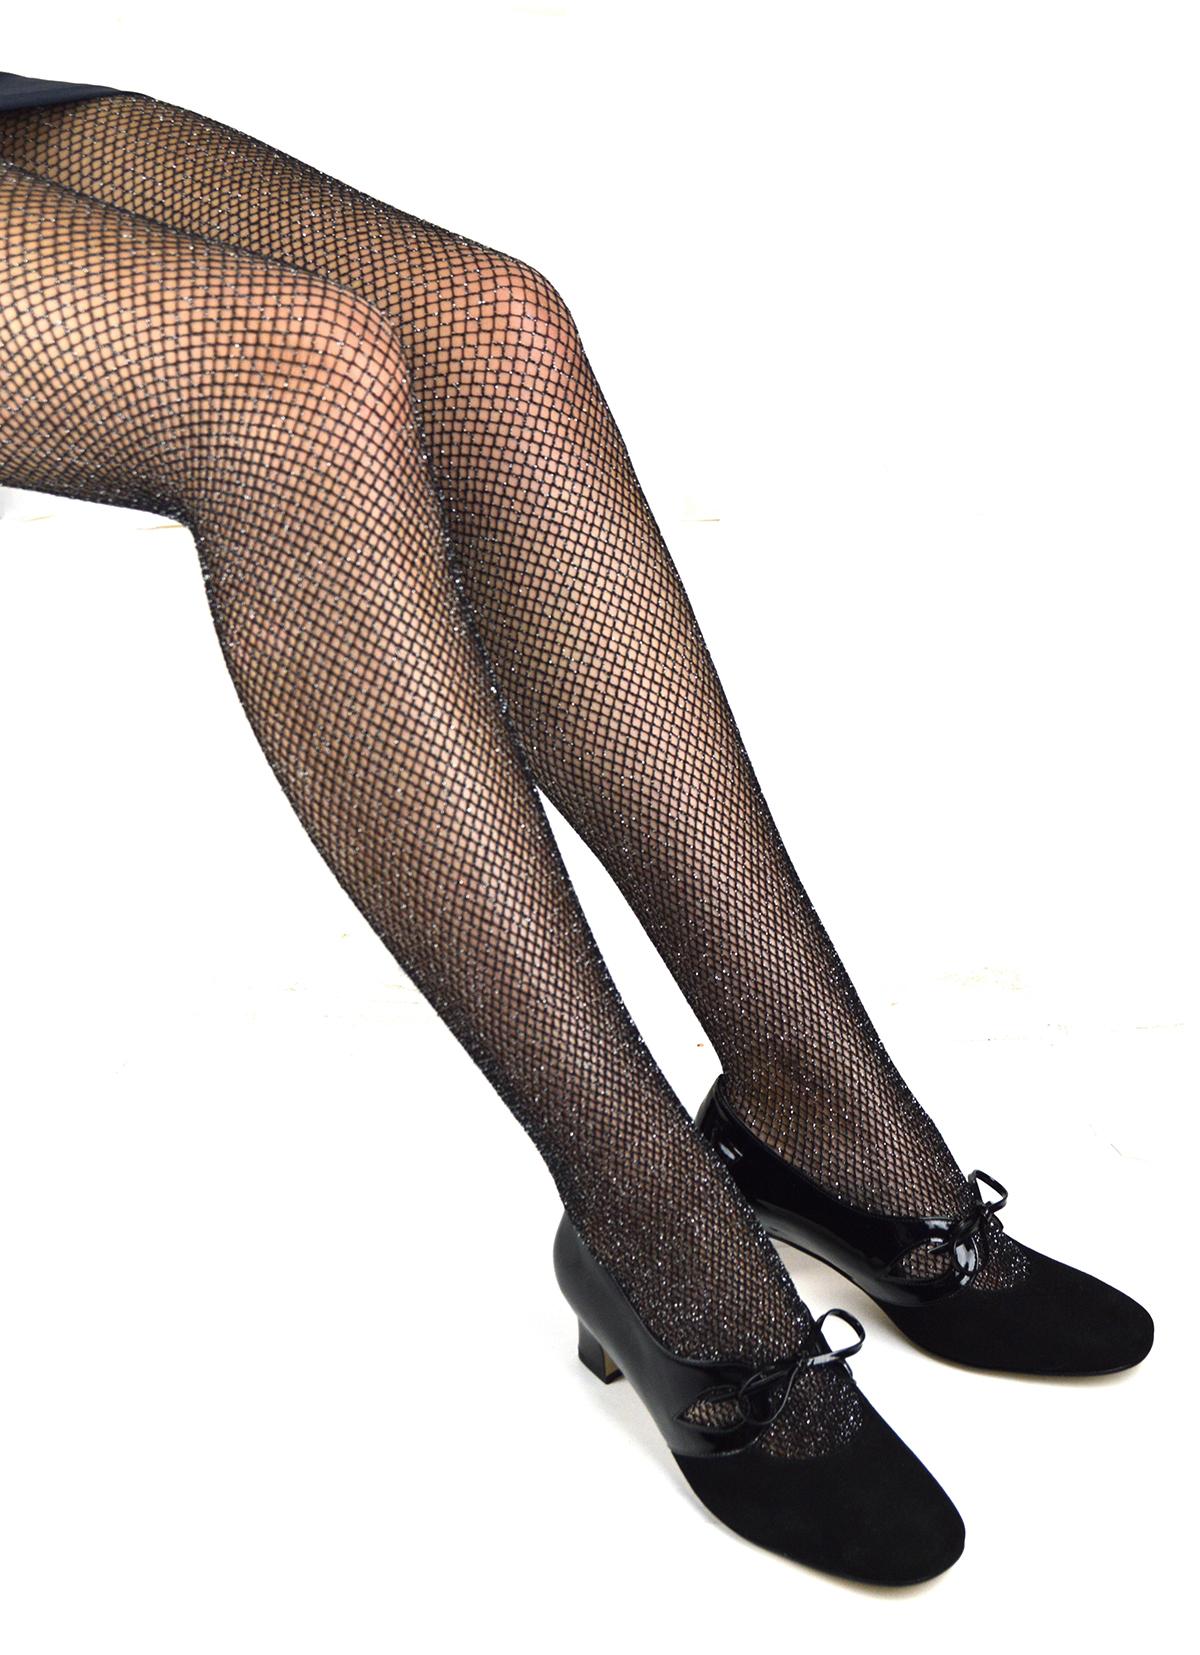 64987fa354b99 Glitter Fishnet Tights – ladies vintage retro 60s – 70s style – Mod ...